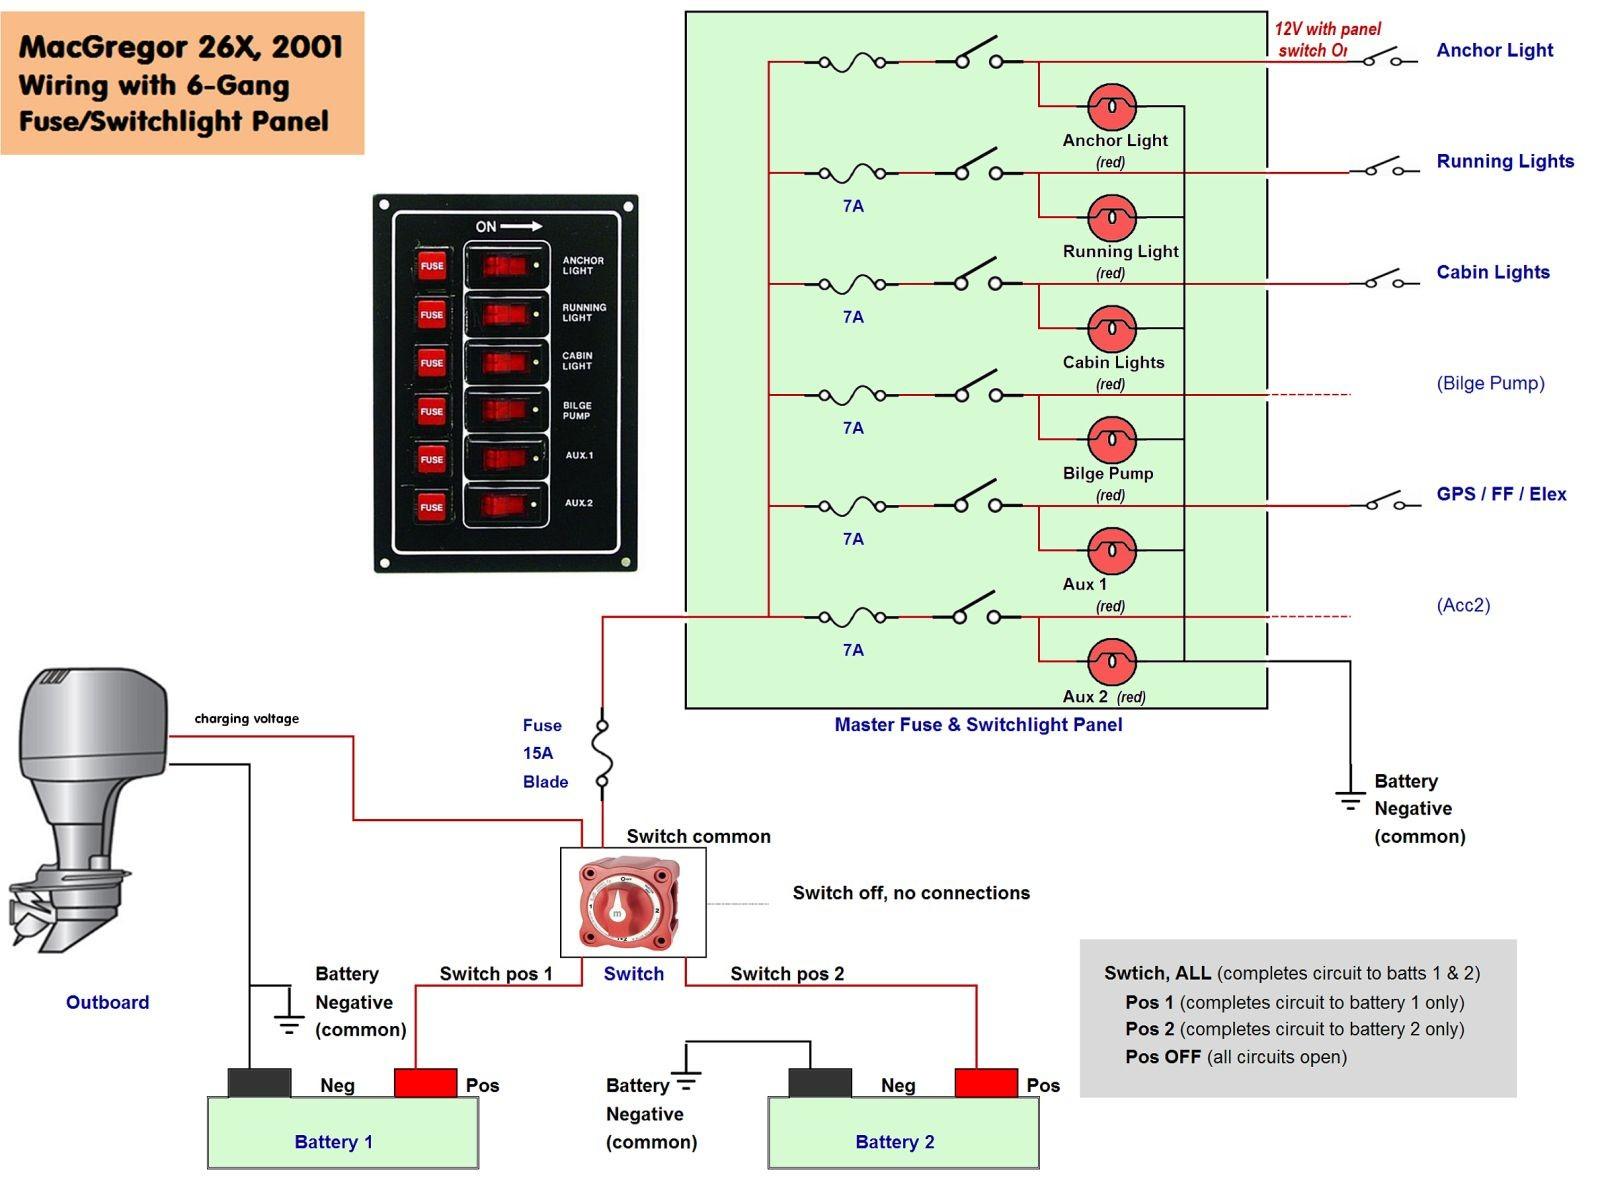 eagle eye wiring diagram explained wiring diagrams rh dmdelectro co 3-Way Switch Wiring Diagram Wiring Diagram Symbols